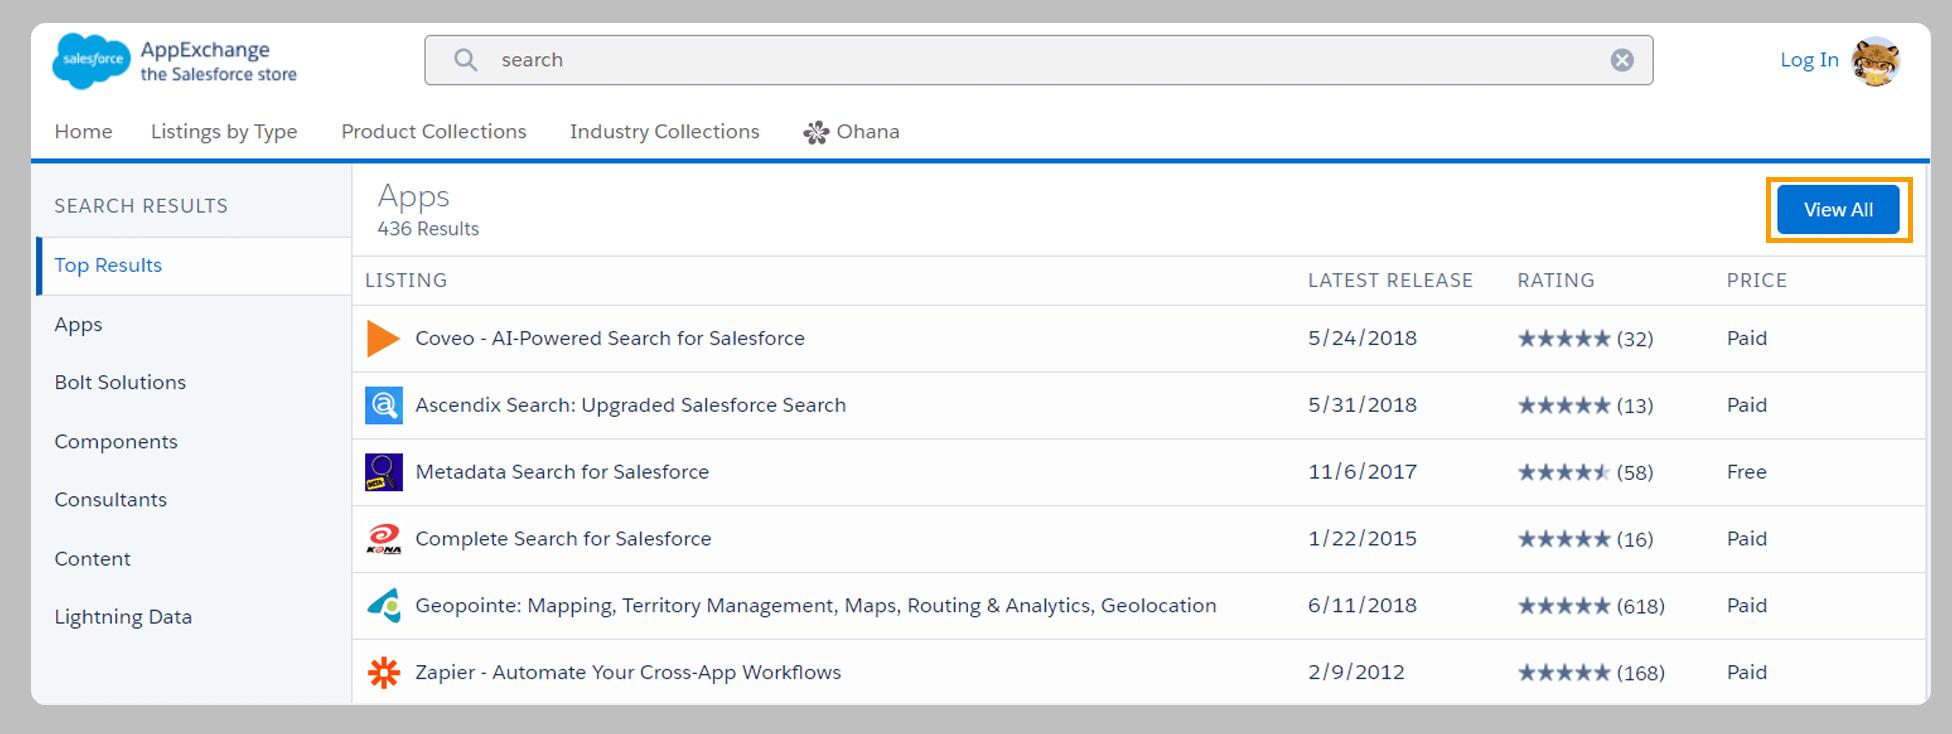 Salesforce App Search on AppExchange